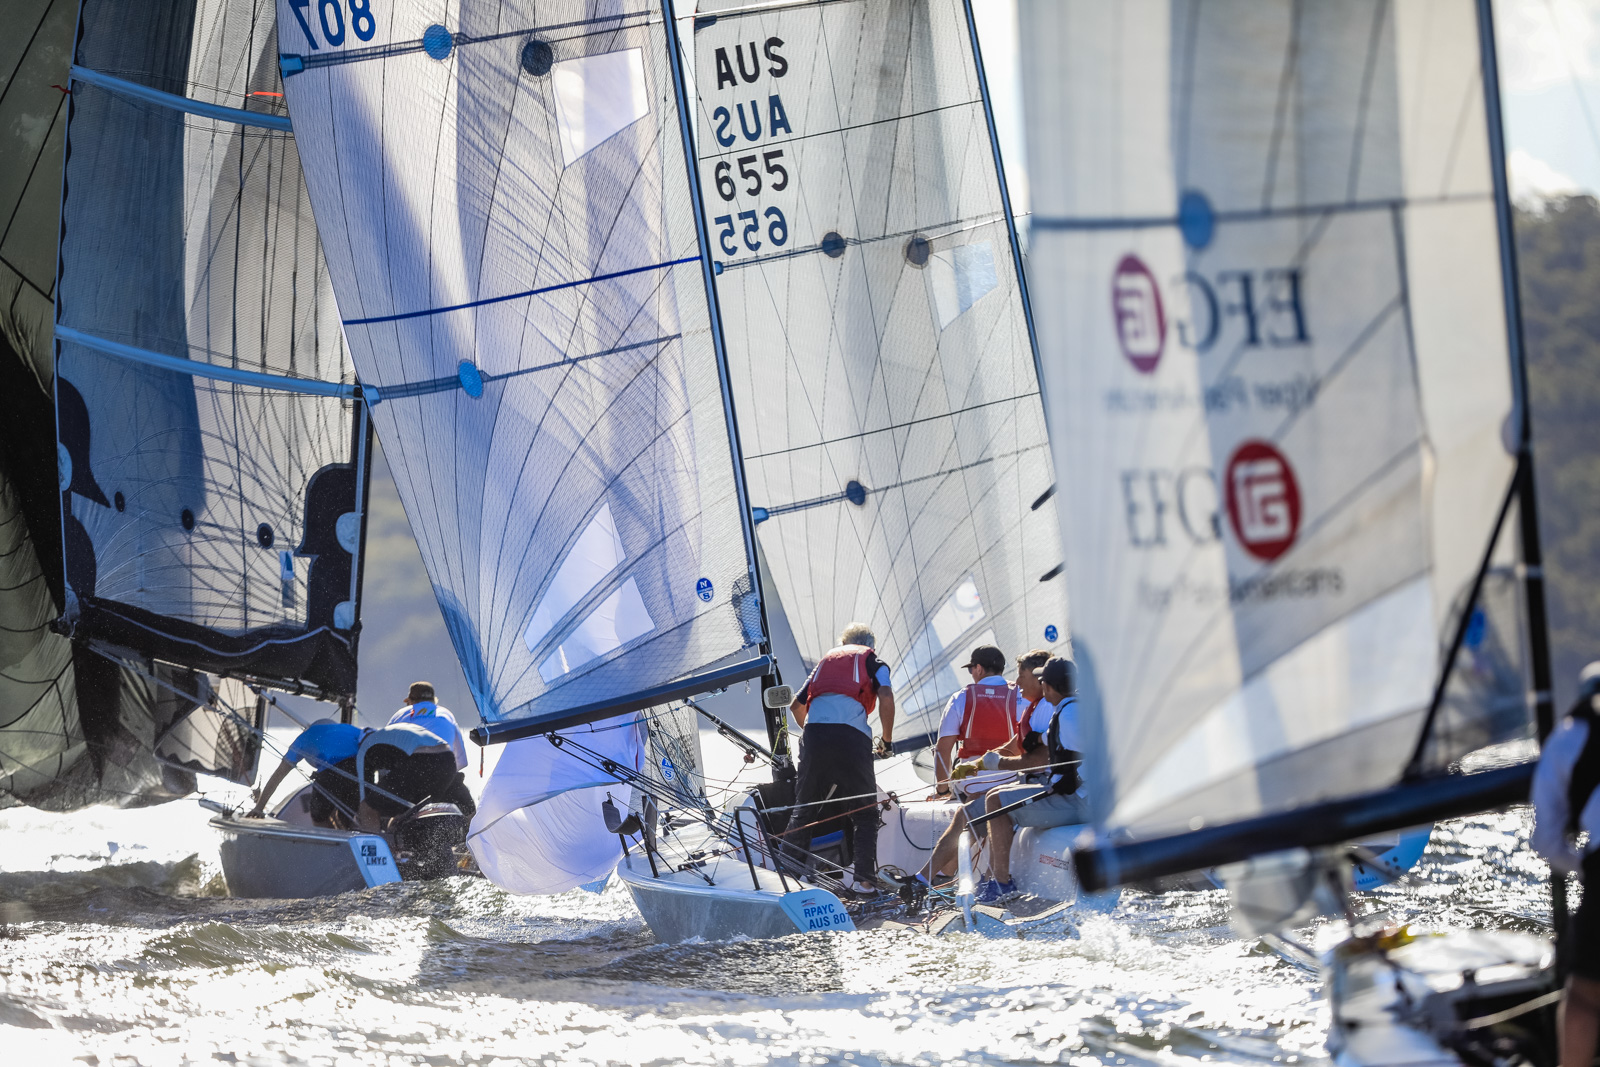 Sports boats at Sail Port Stephens 2017. Photo credit Salty Dingo